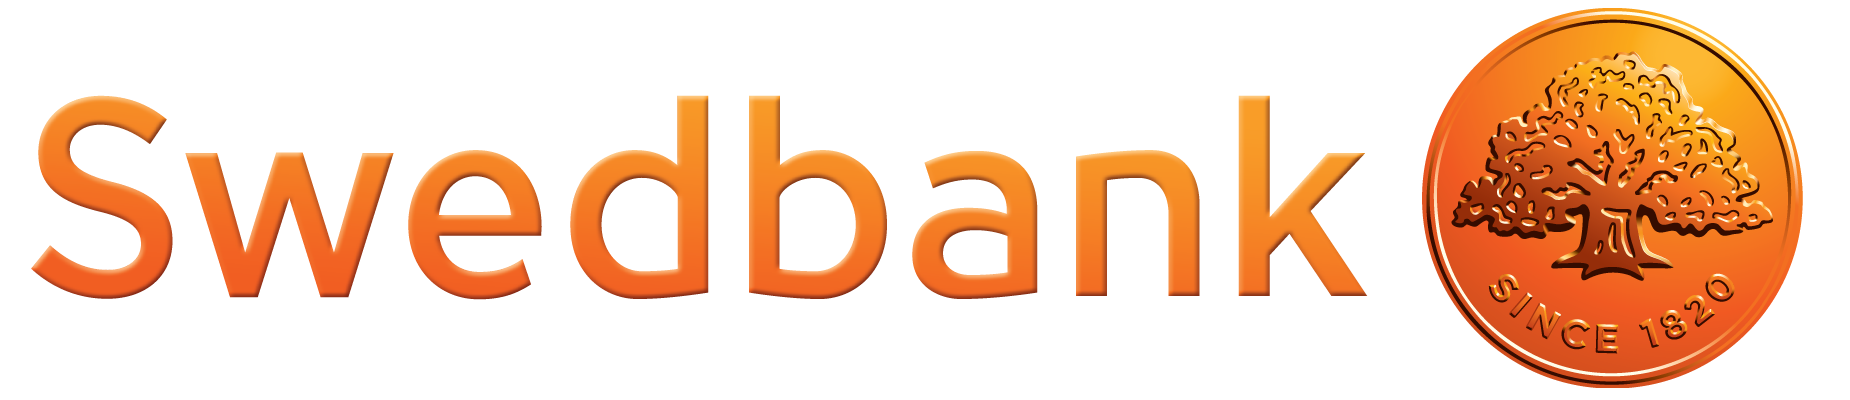 Swedbank_logo_logotype_emblem